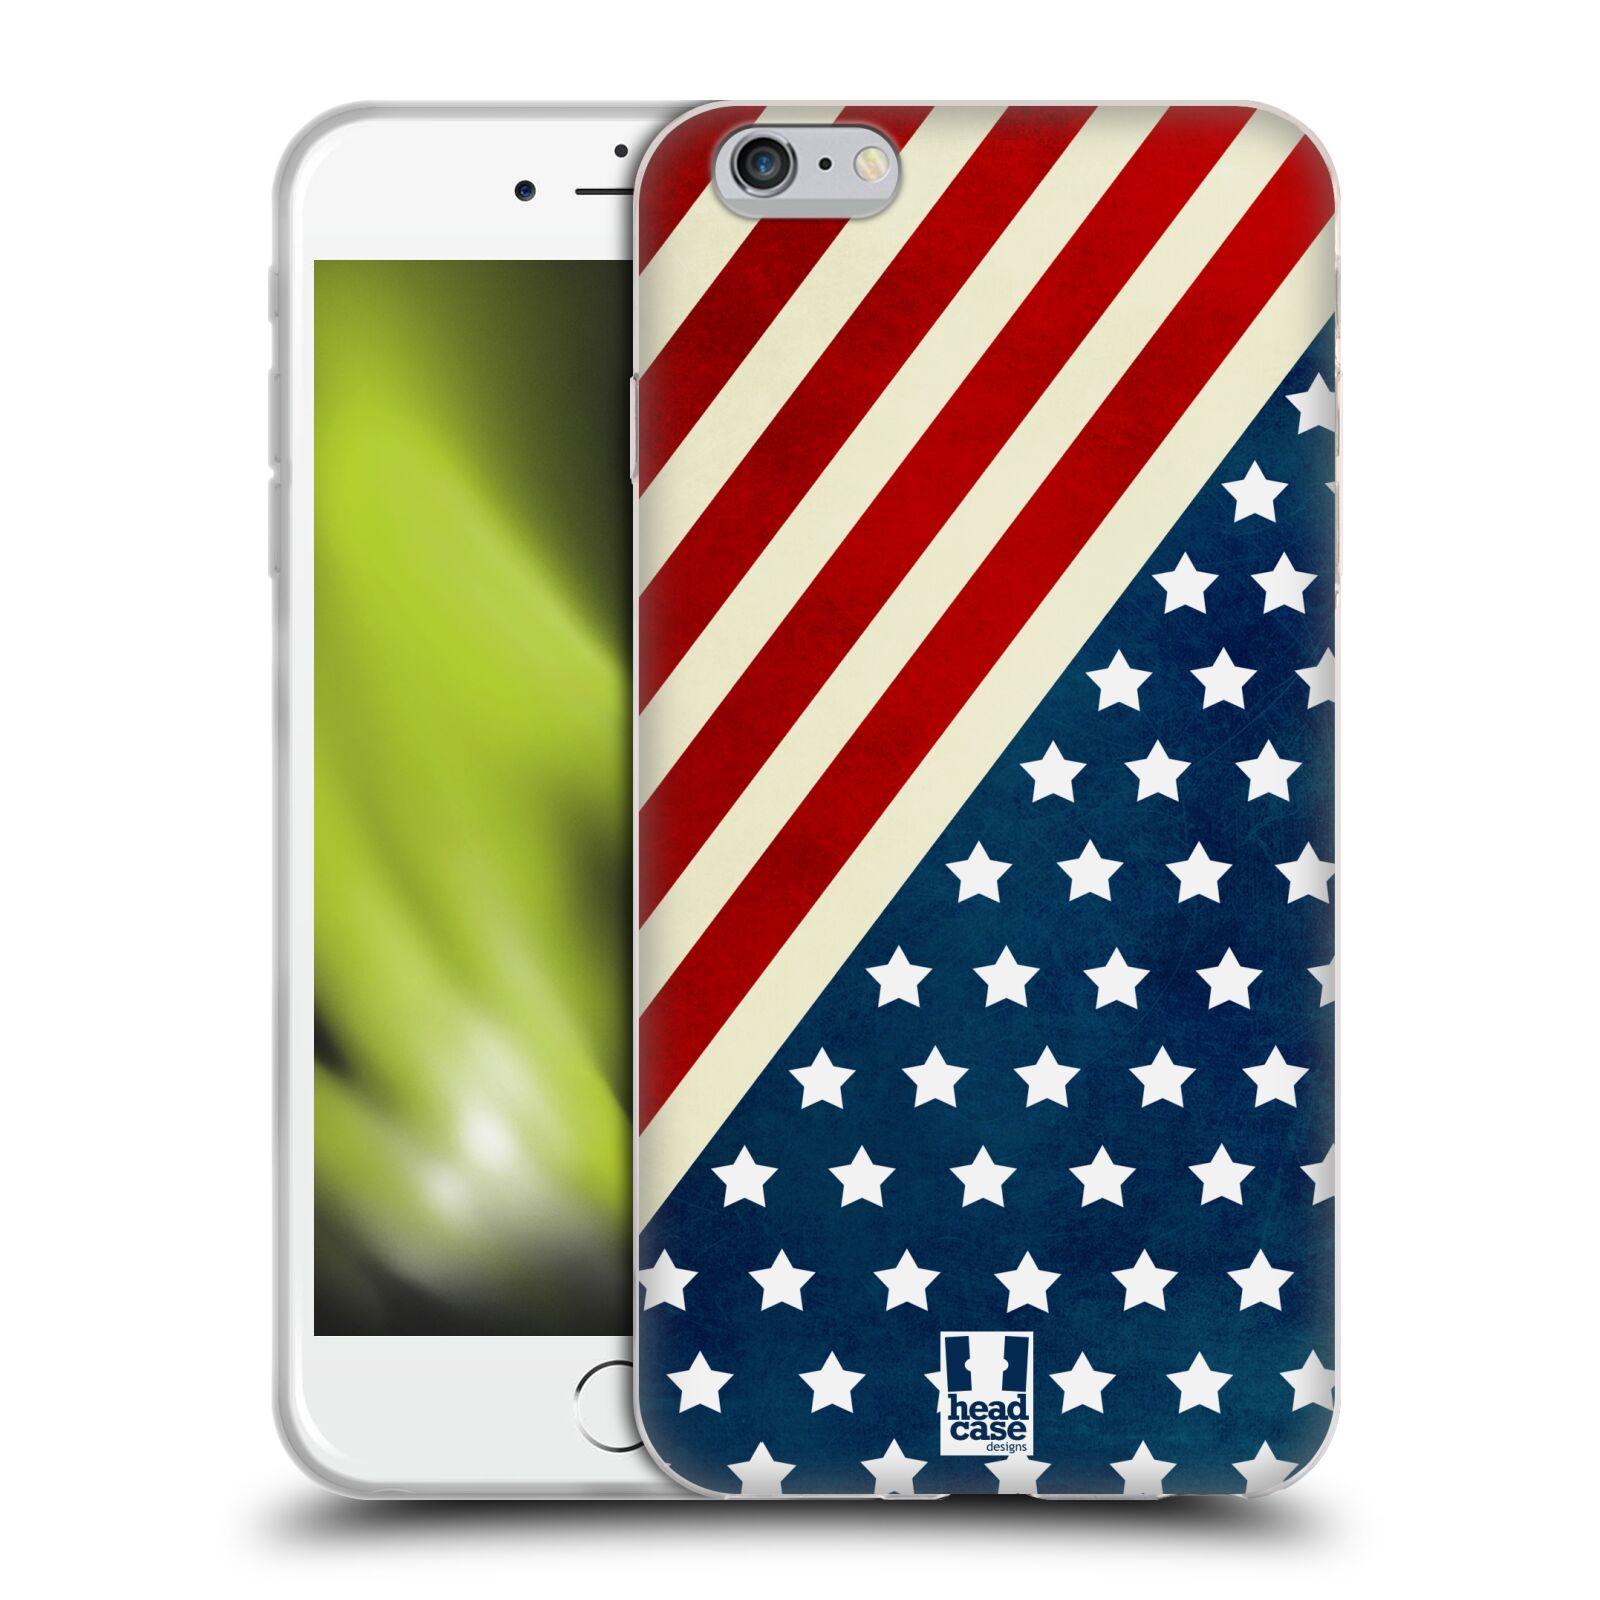 HEAD CASE silikonový obal na mobil Apple Iphone 6 PLUS/ 6S PLUS vzor USA VLAJKA DIAGONÁLA